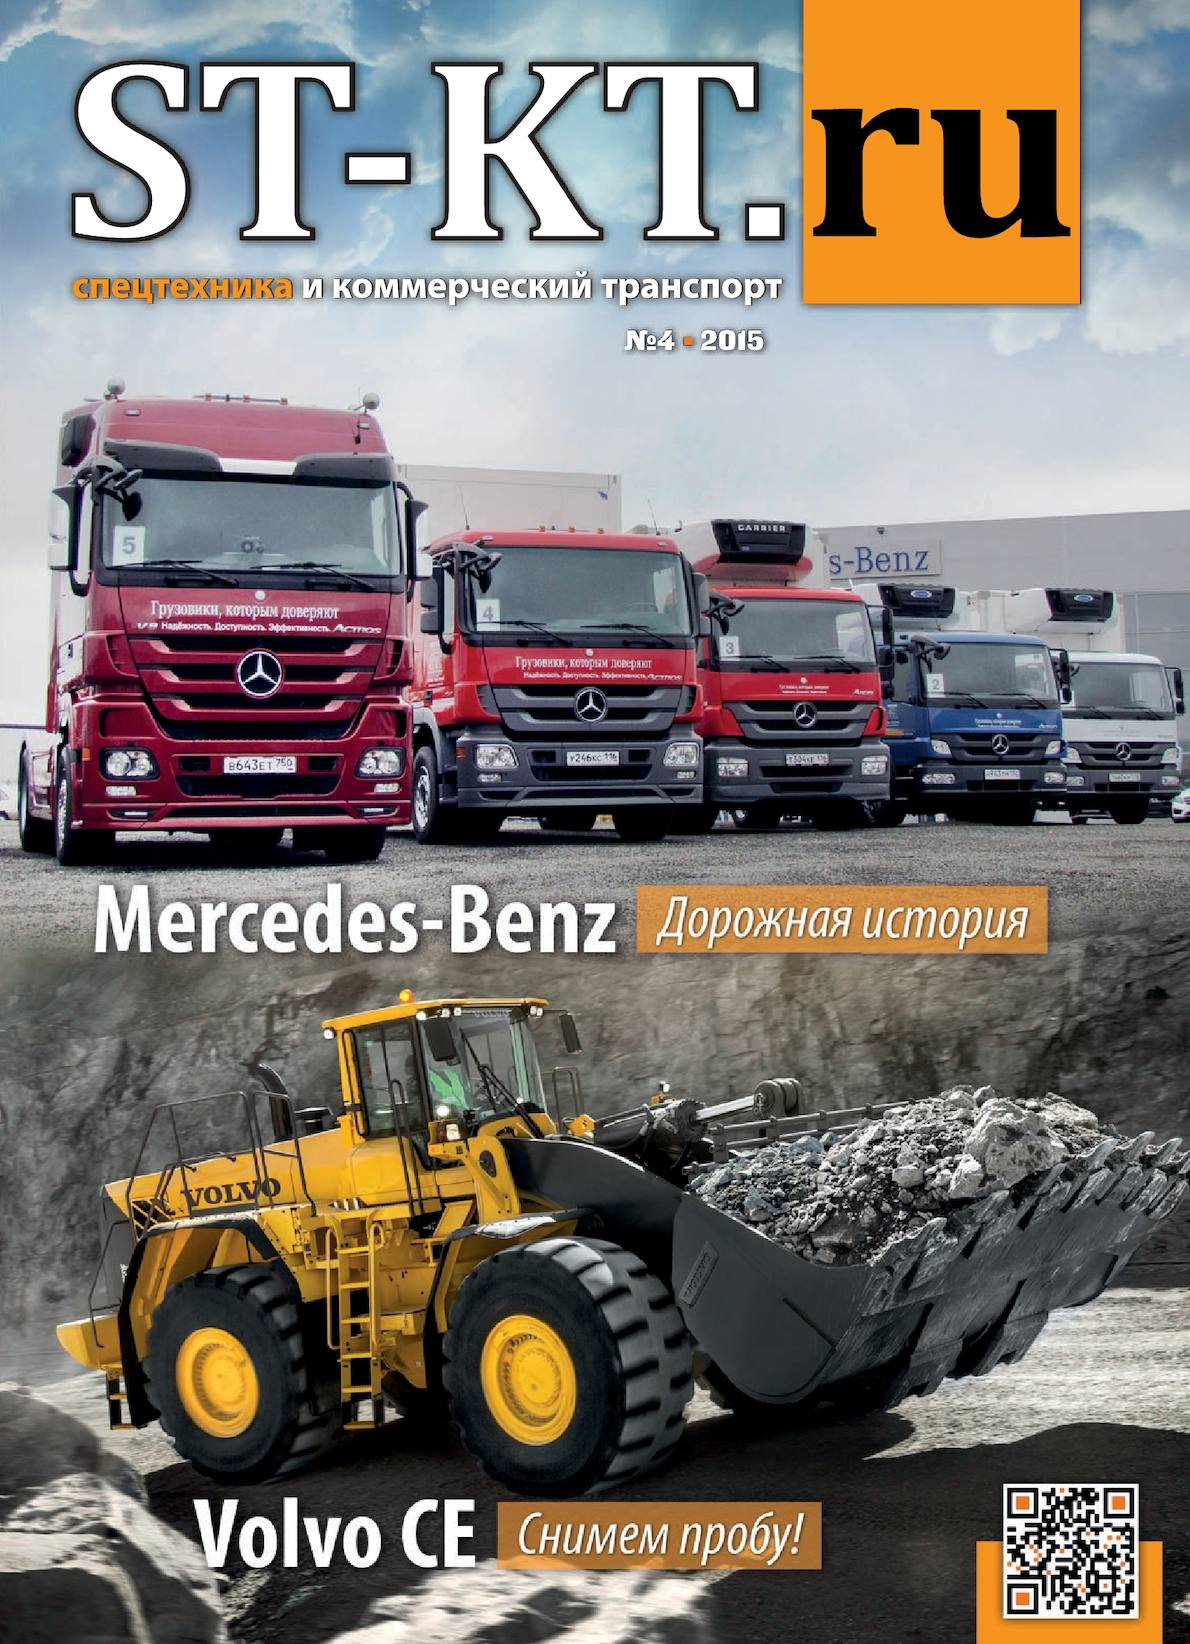 СпецТехника и Коммерческий Транспорт №4/2015